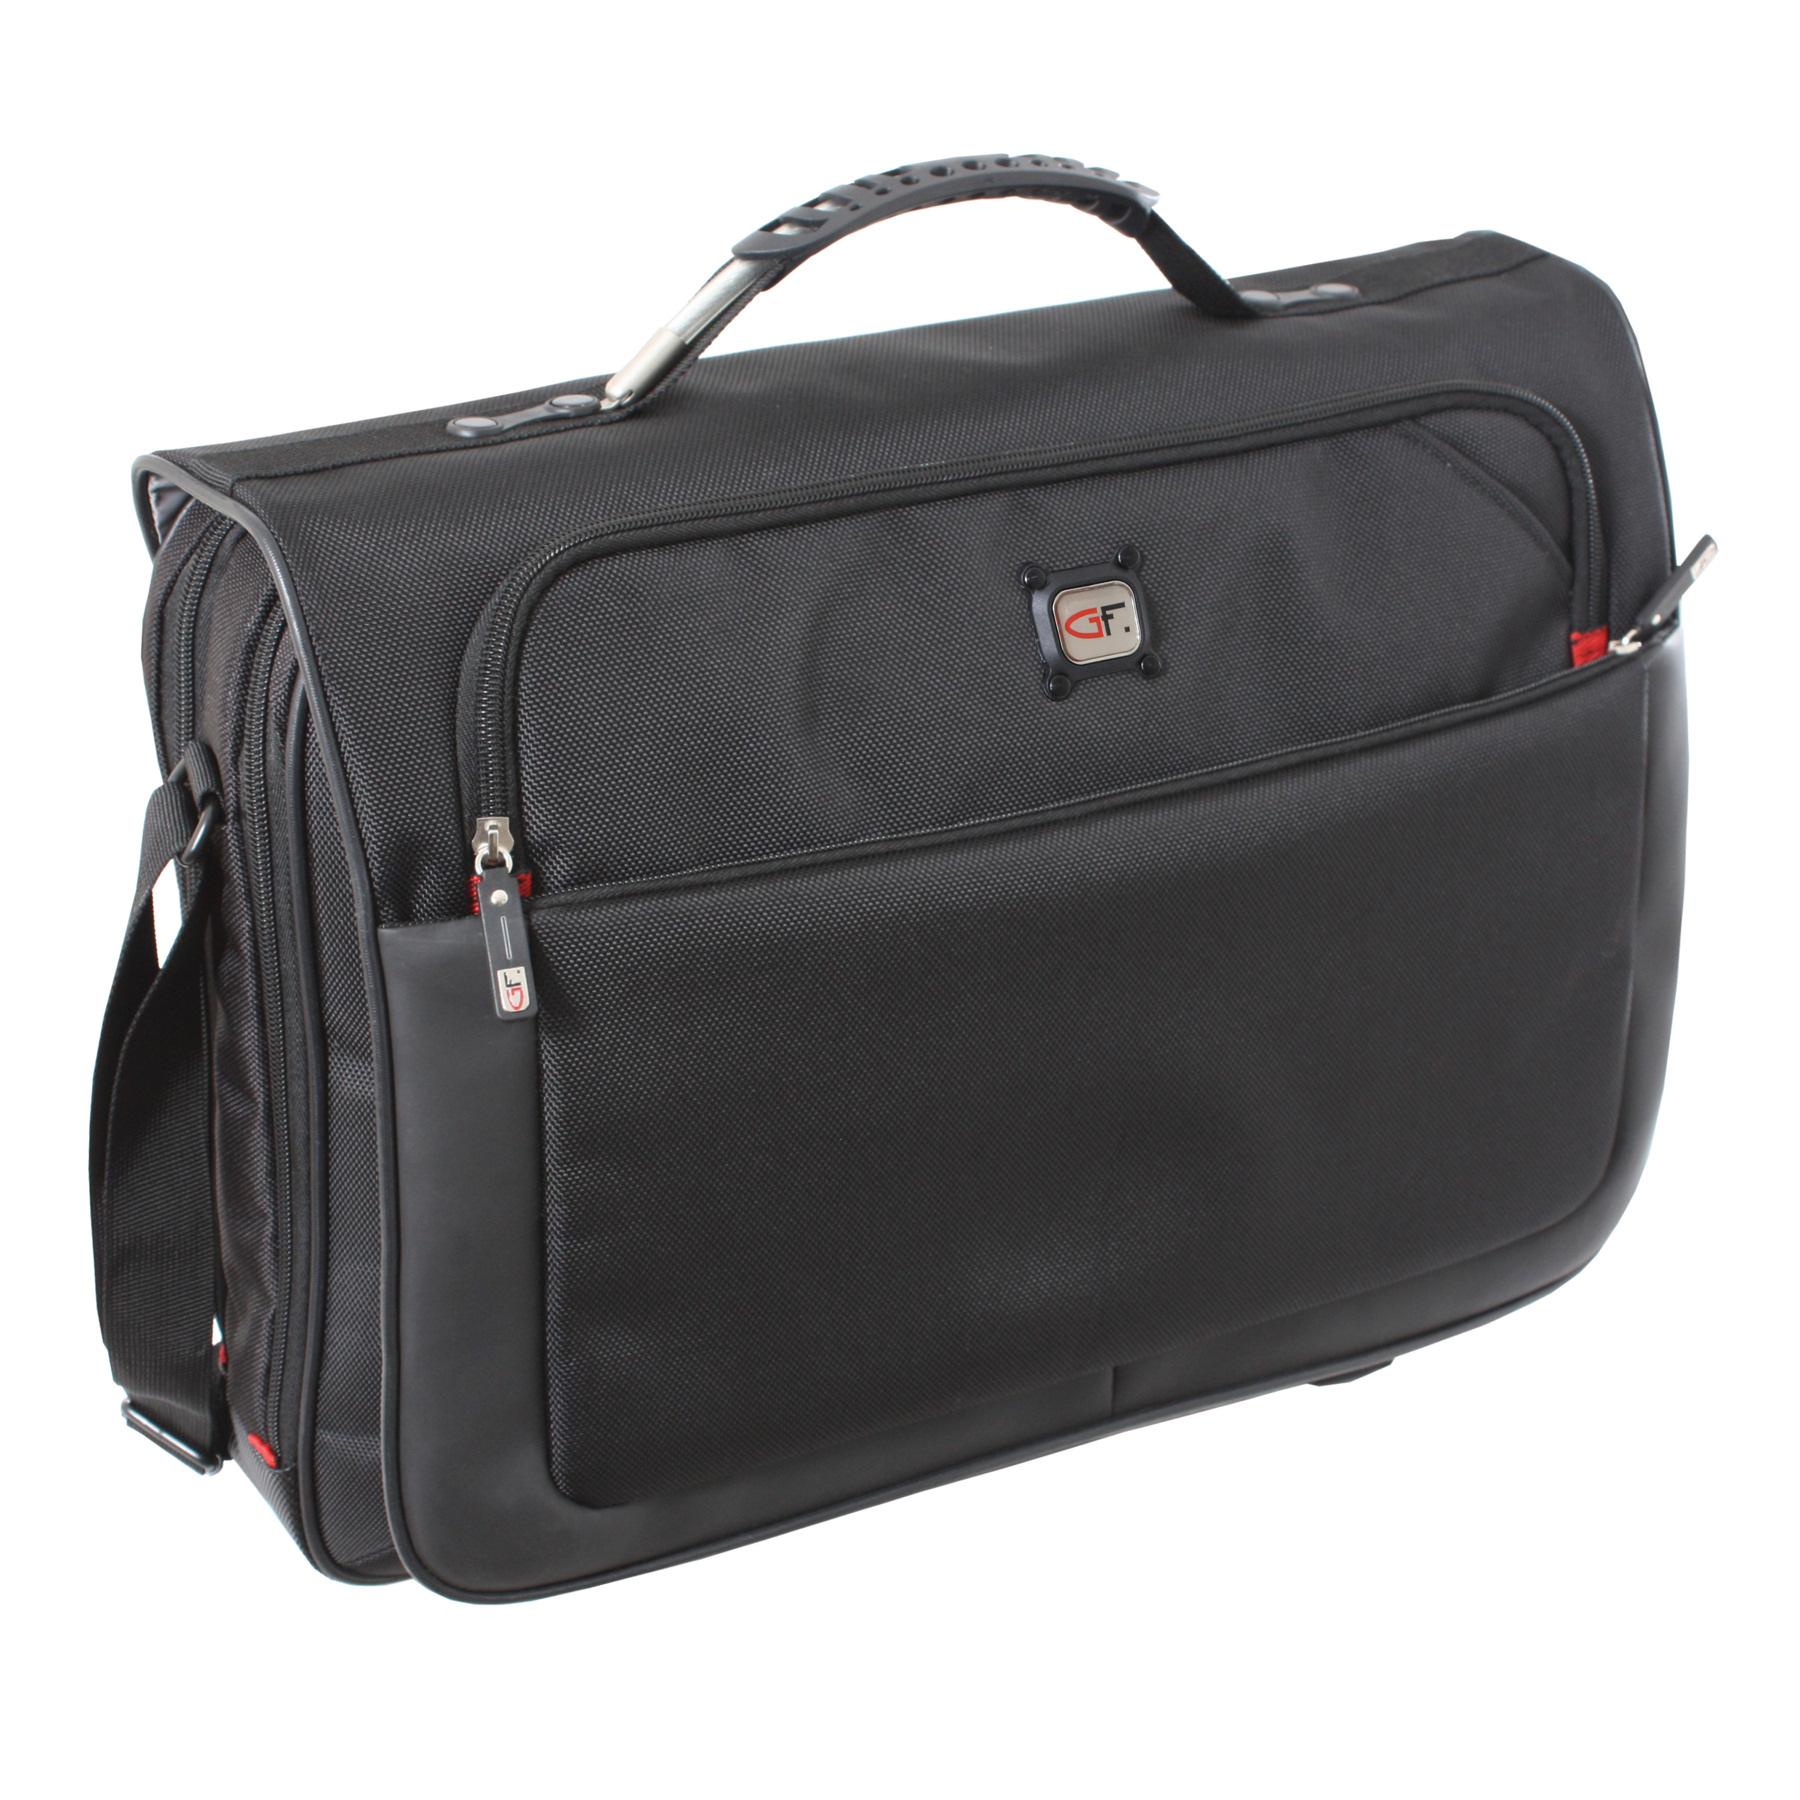 Gino Ferrari Titan Messenger Bag Black GF521